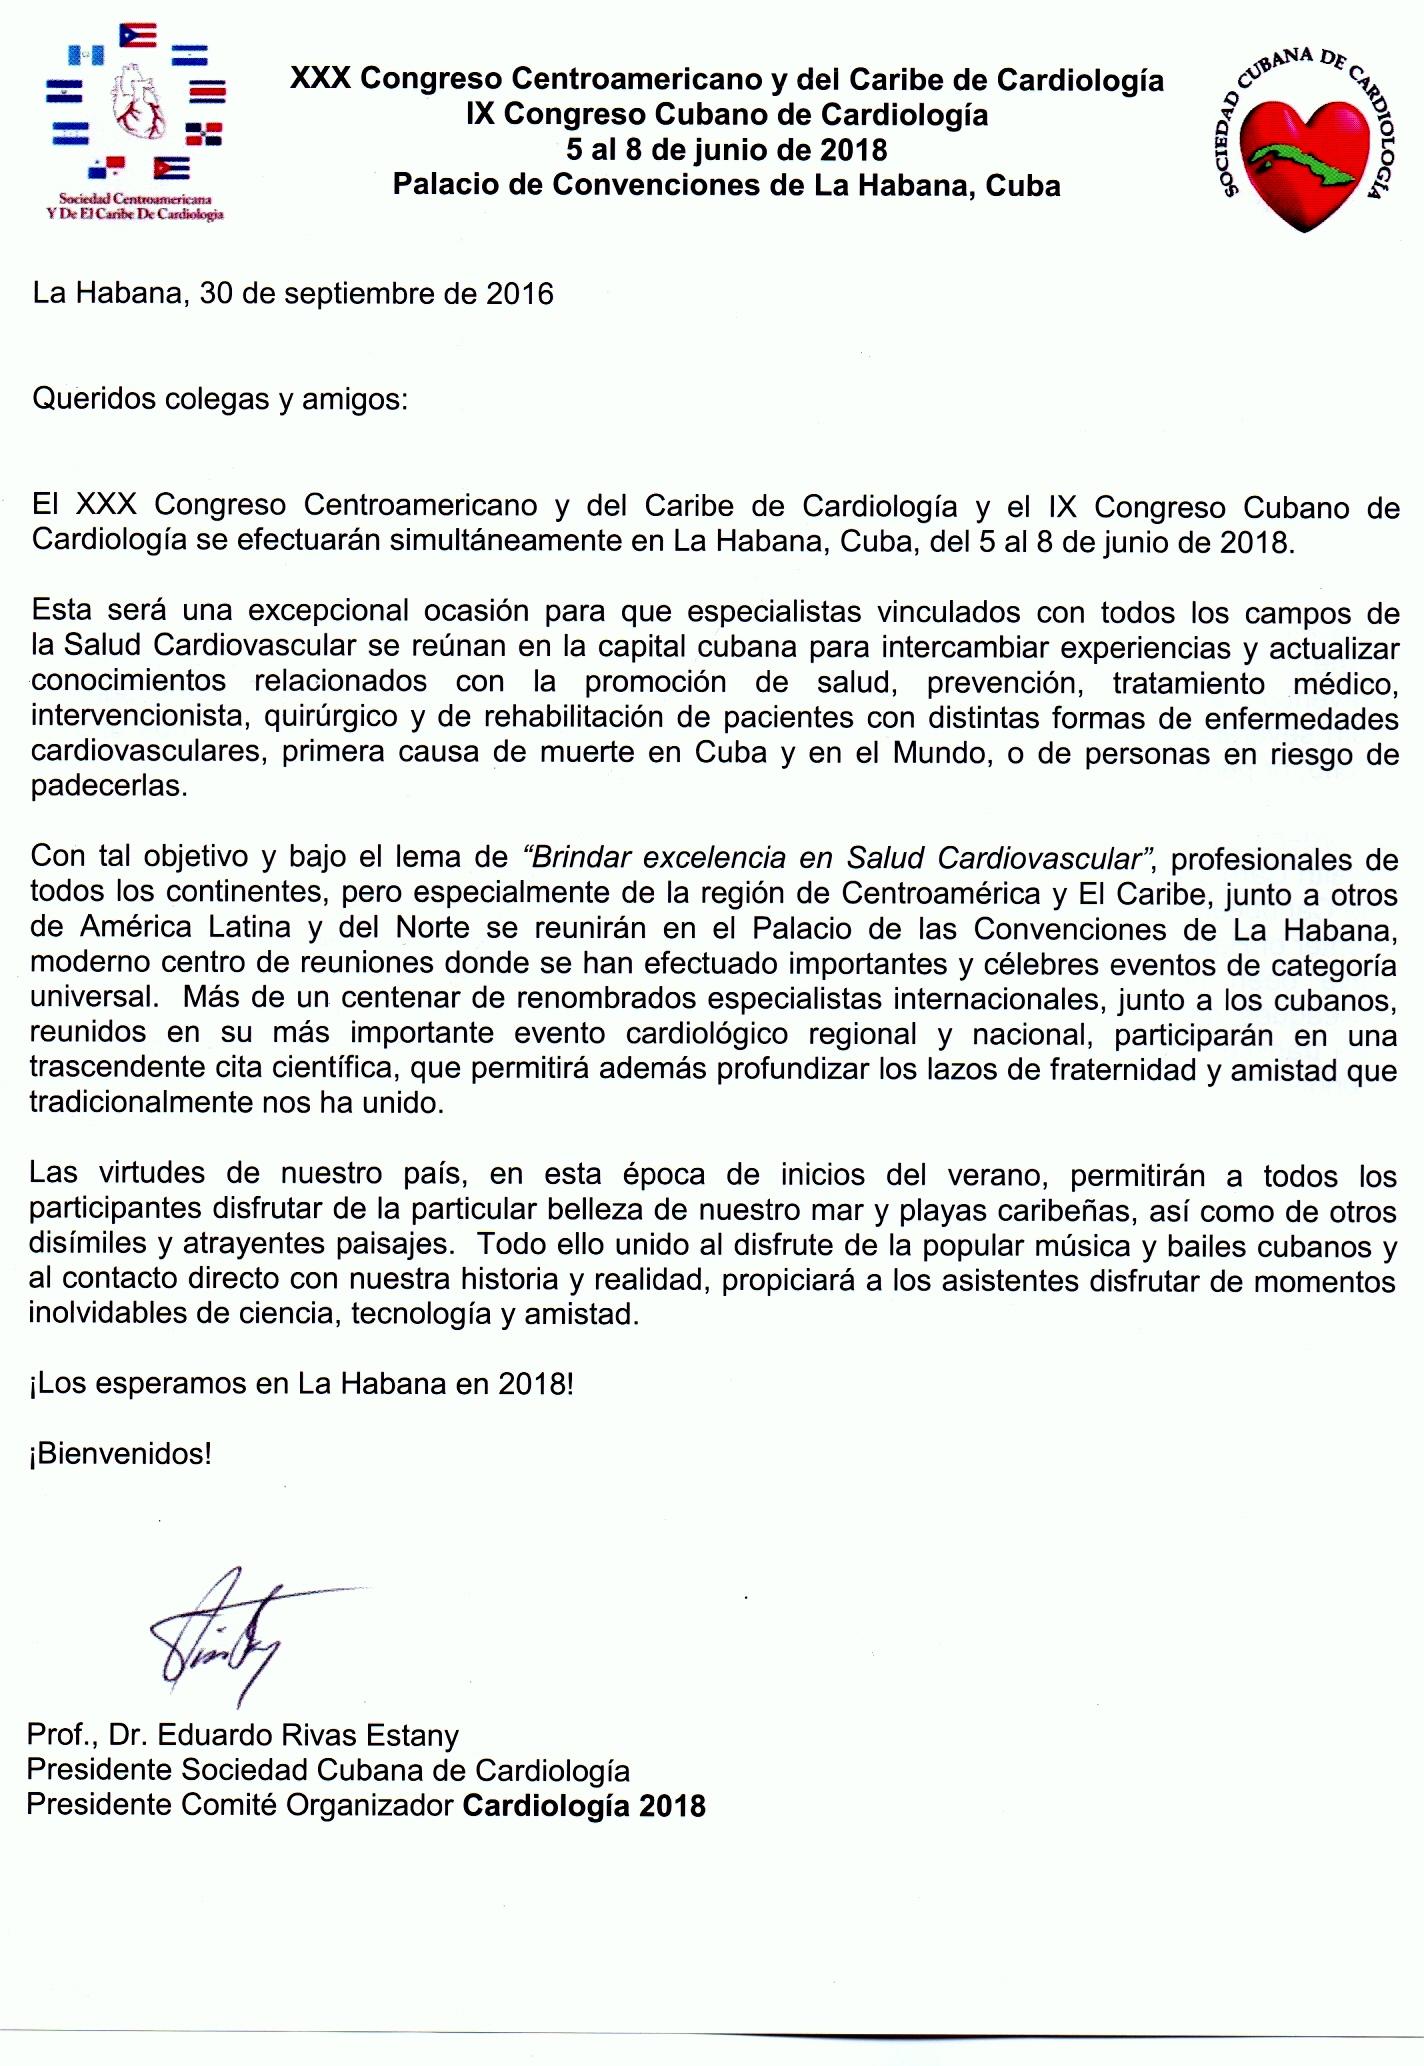 1er Anuncio Congreso XXX CCC Cardiologia y IX Cubano Cardiologia ESPAÑOL